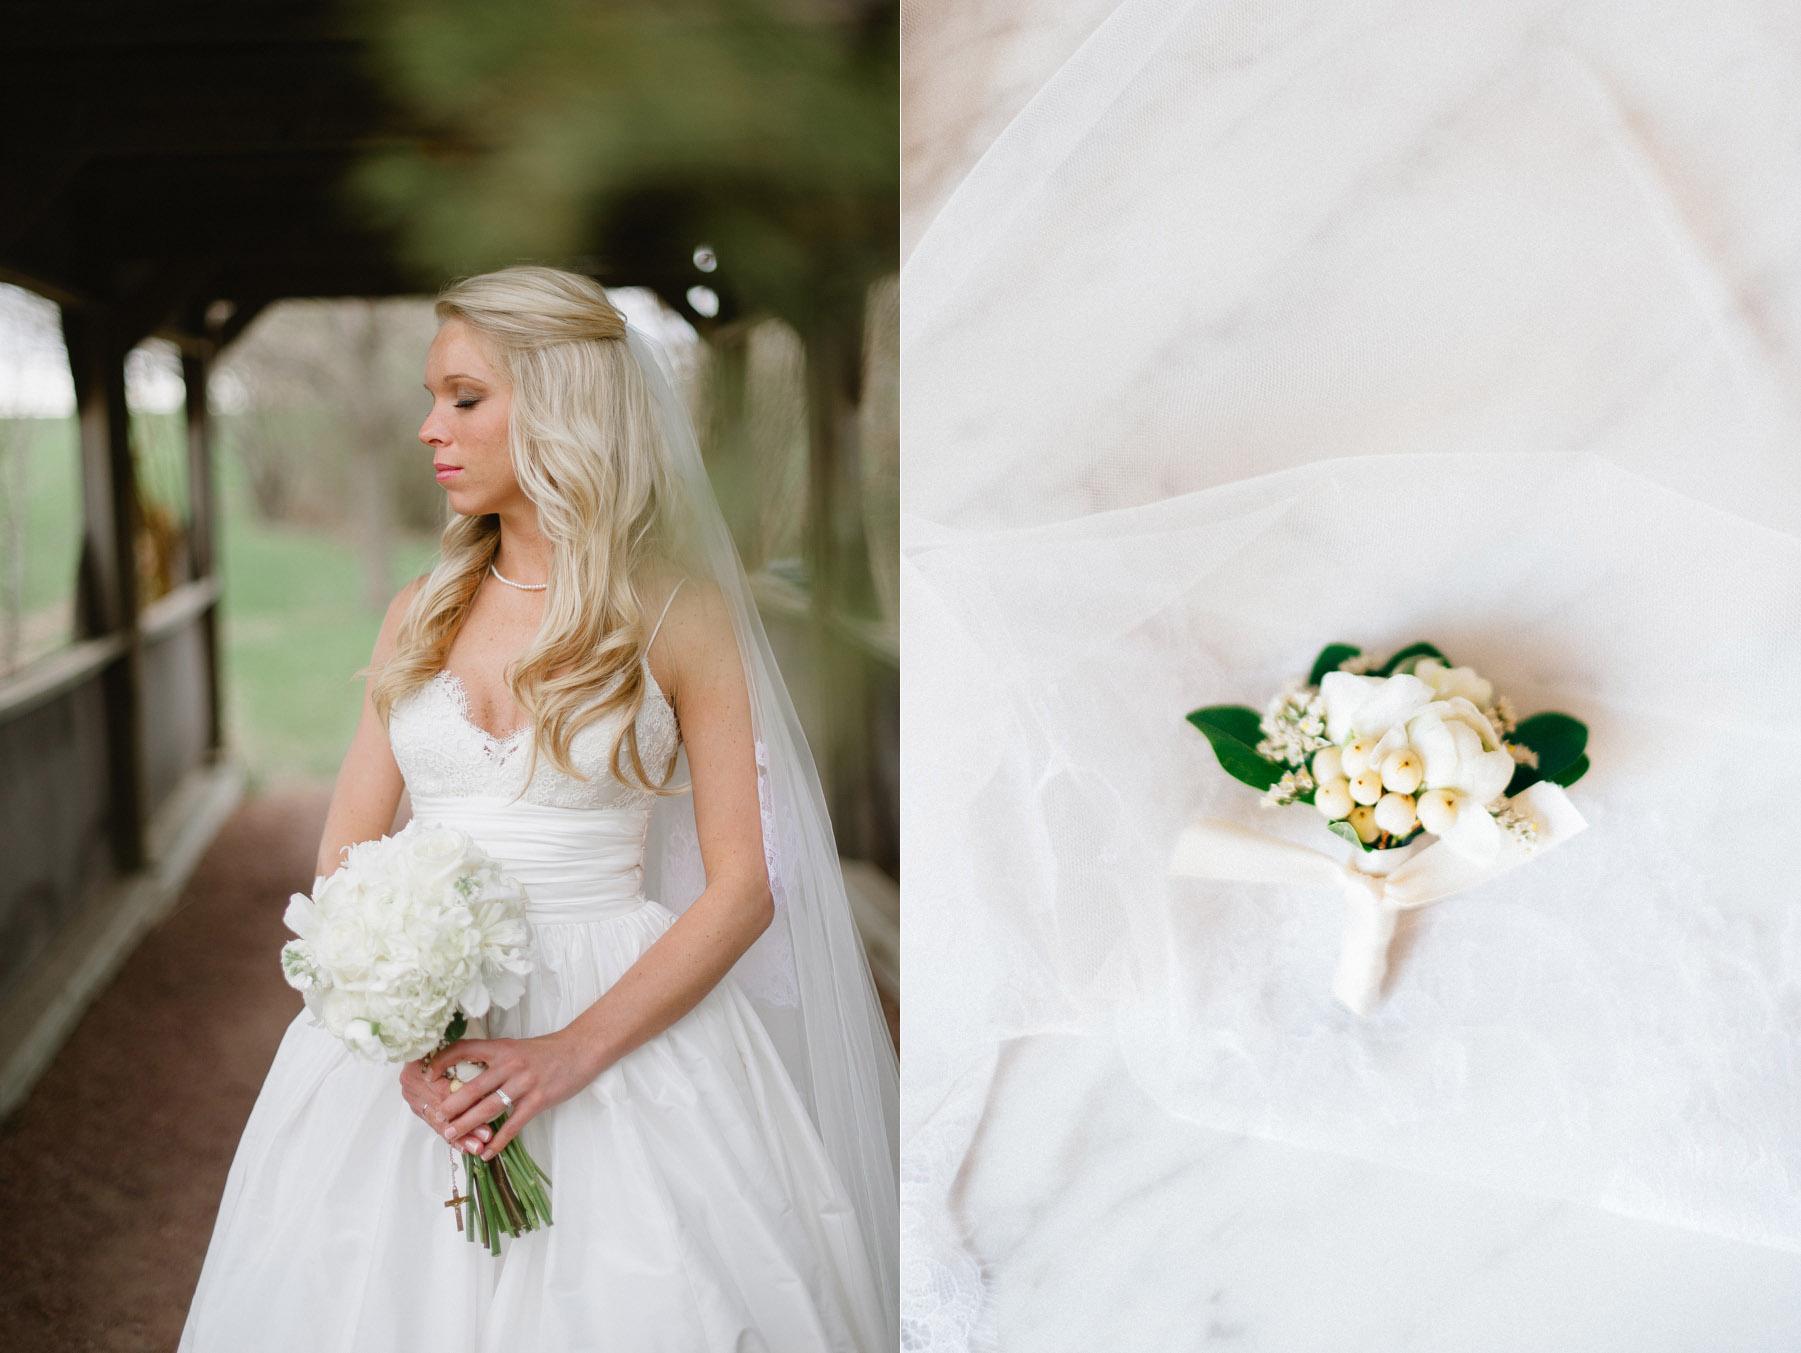 Liz-and-Lance-Wedding-14.jpg